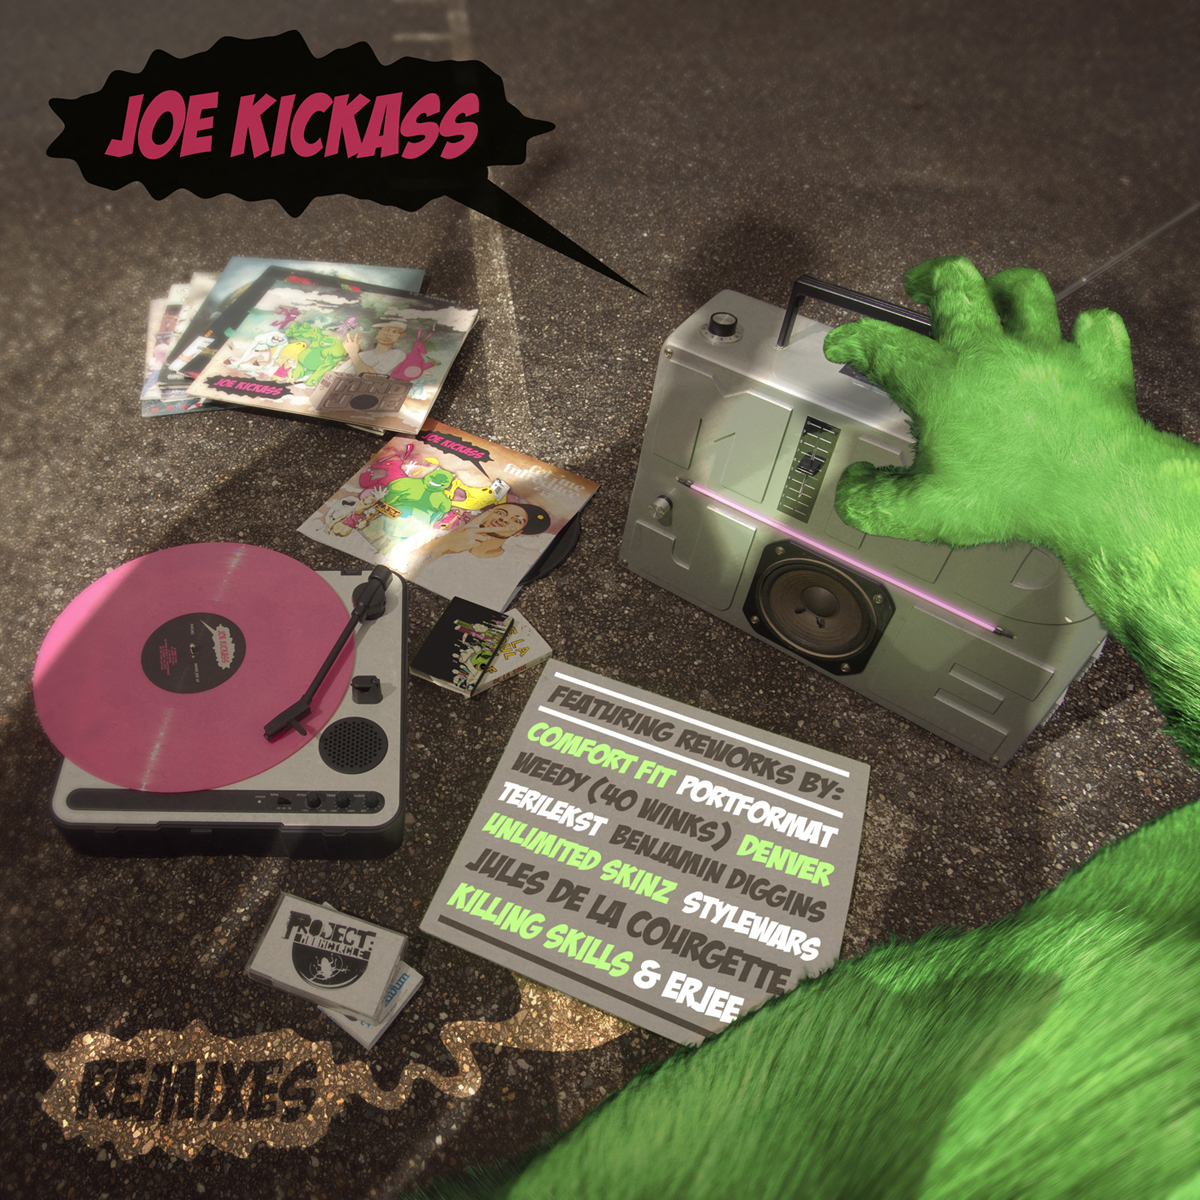 Free Download: Joe Kickass – Mind Joe Remixes (2011)